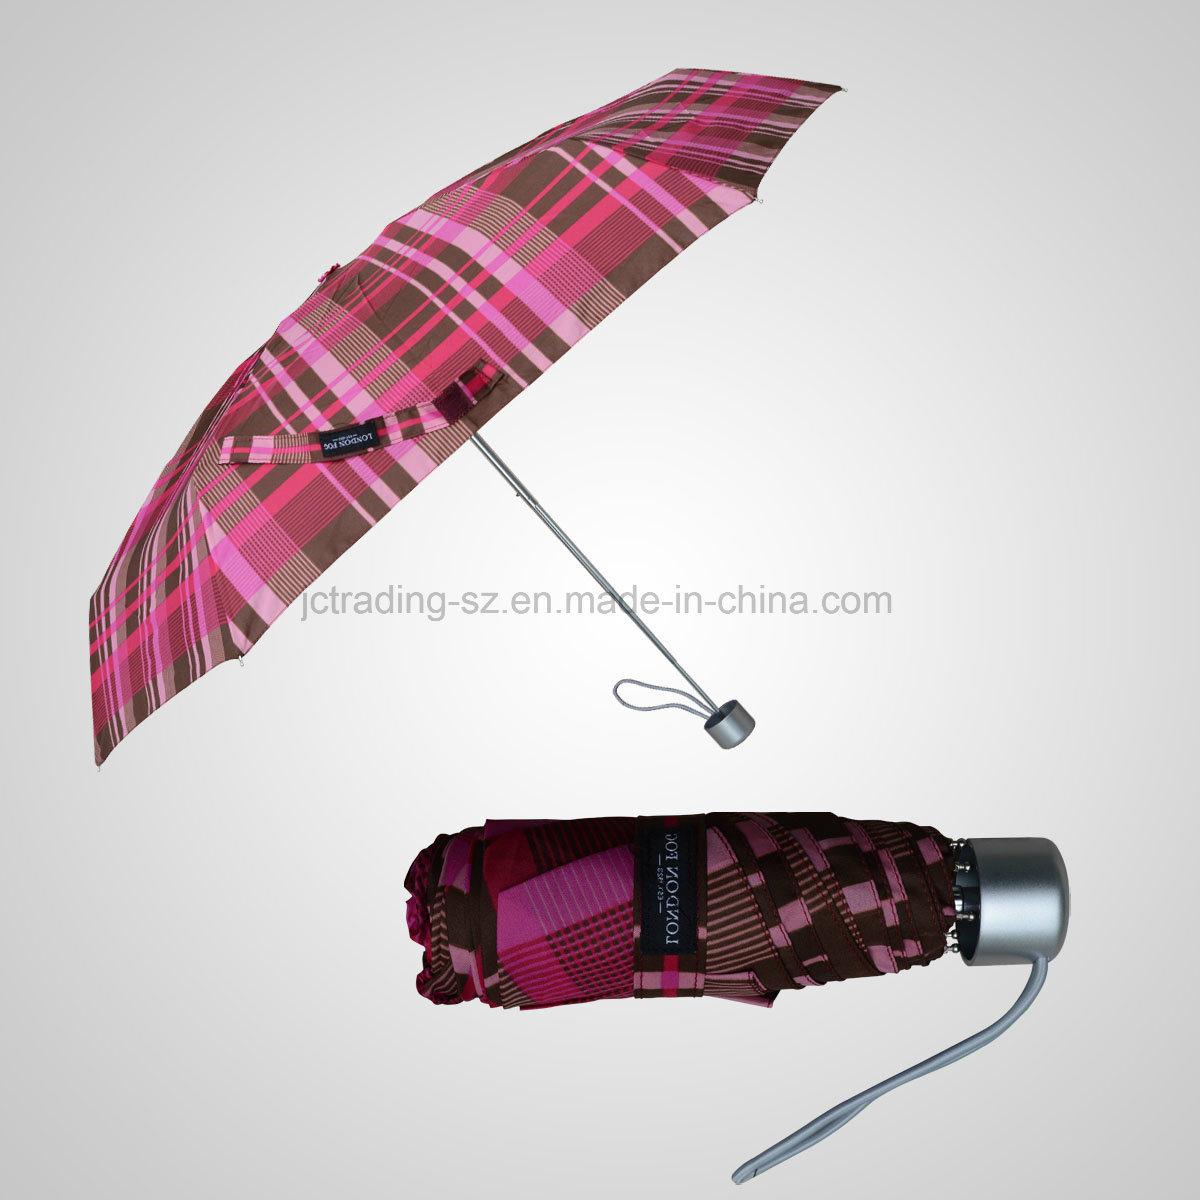 5 Folding Manual Mini Lady Umbrella Rain/Sun Umbrella (JF-MLF501)